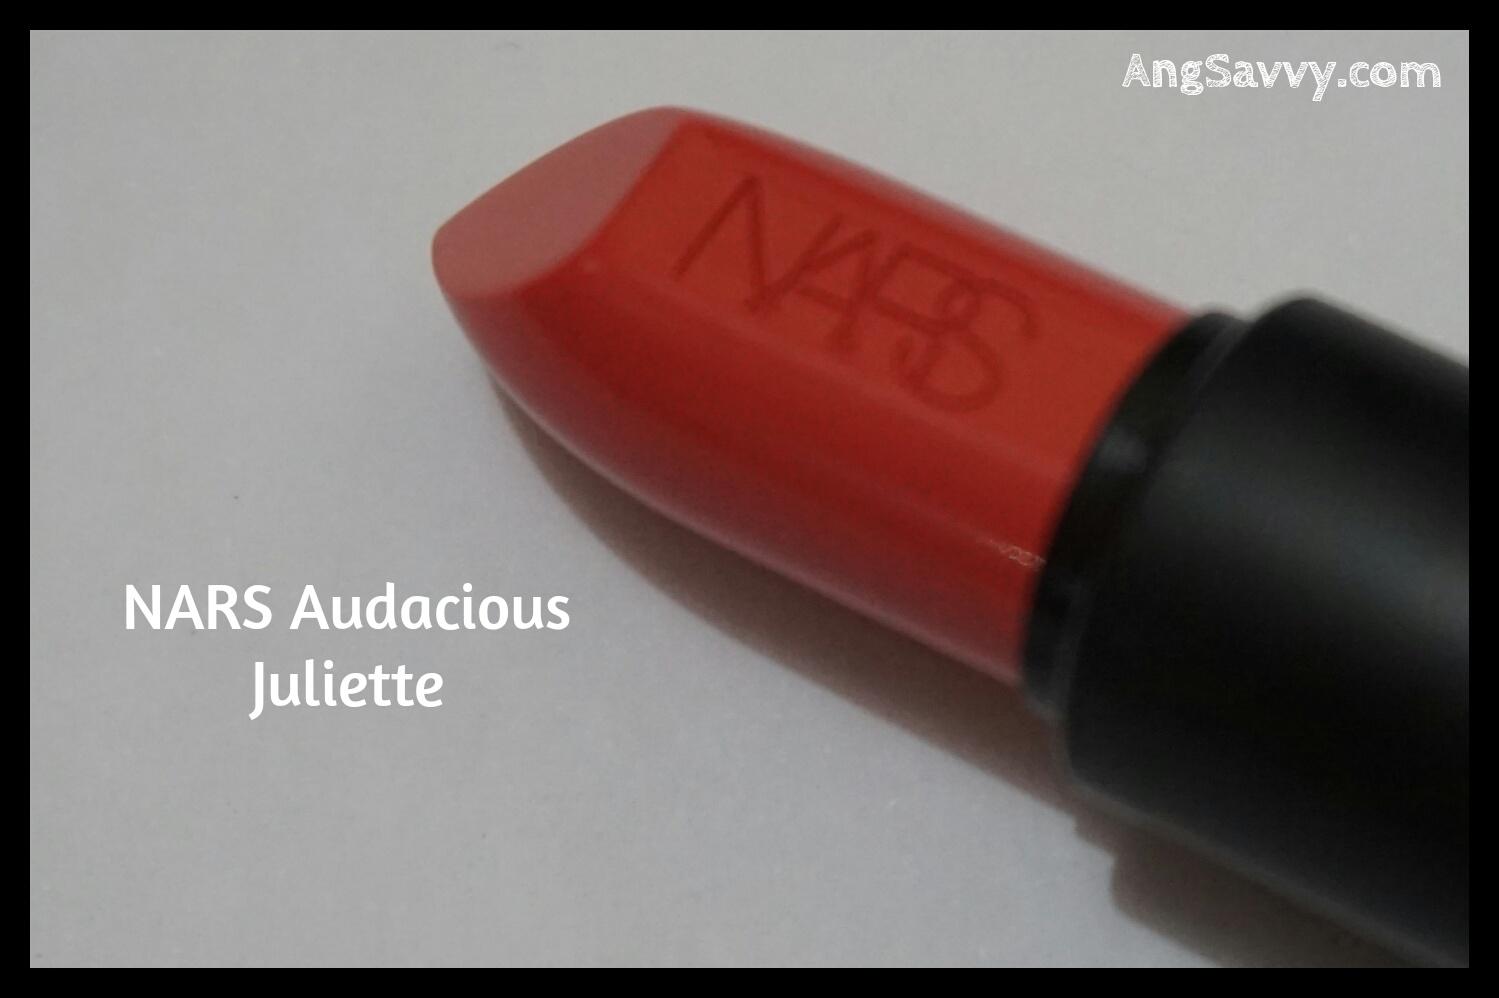 NARS Juliette Audacious Lipstick